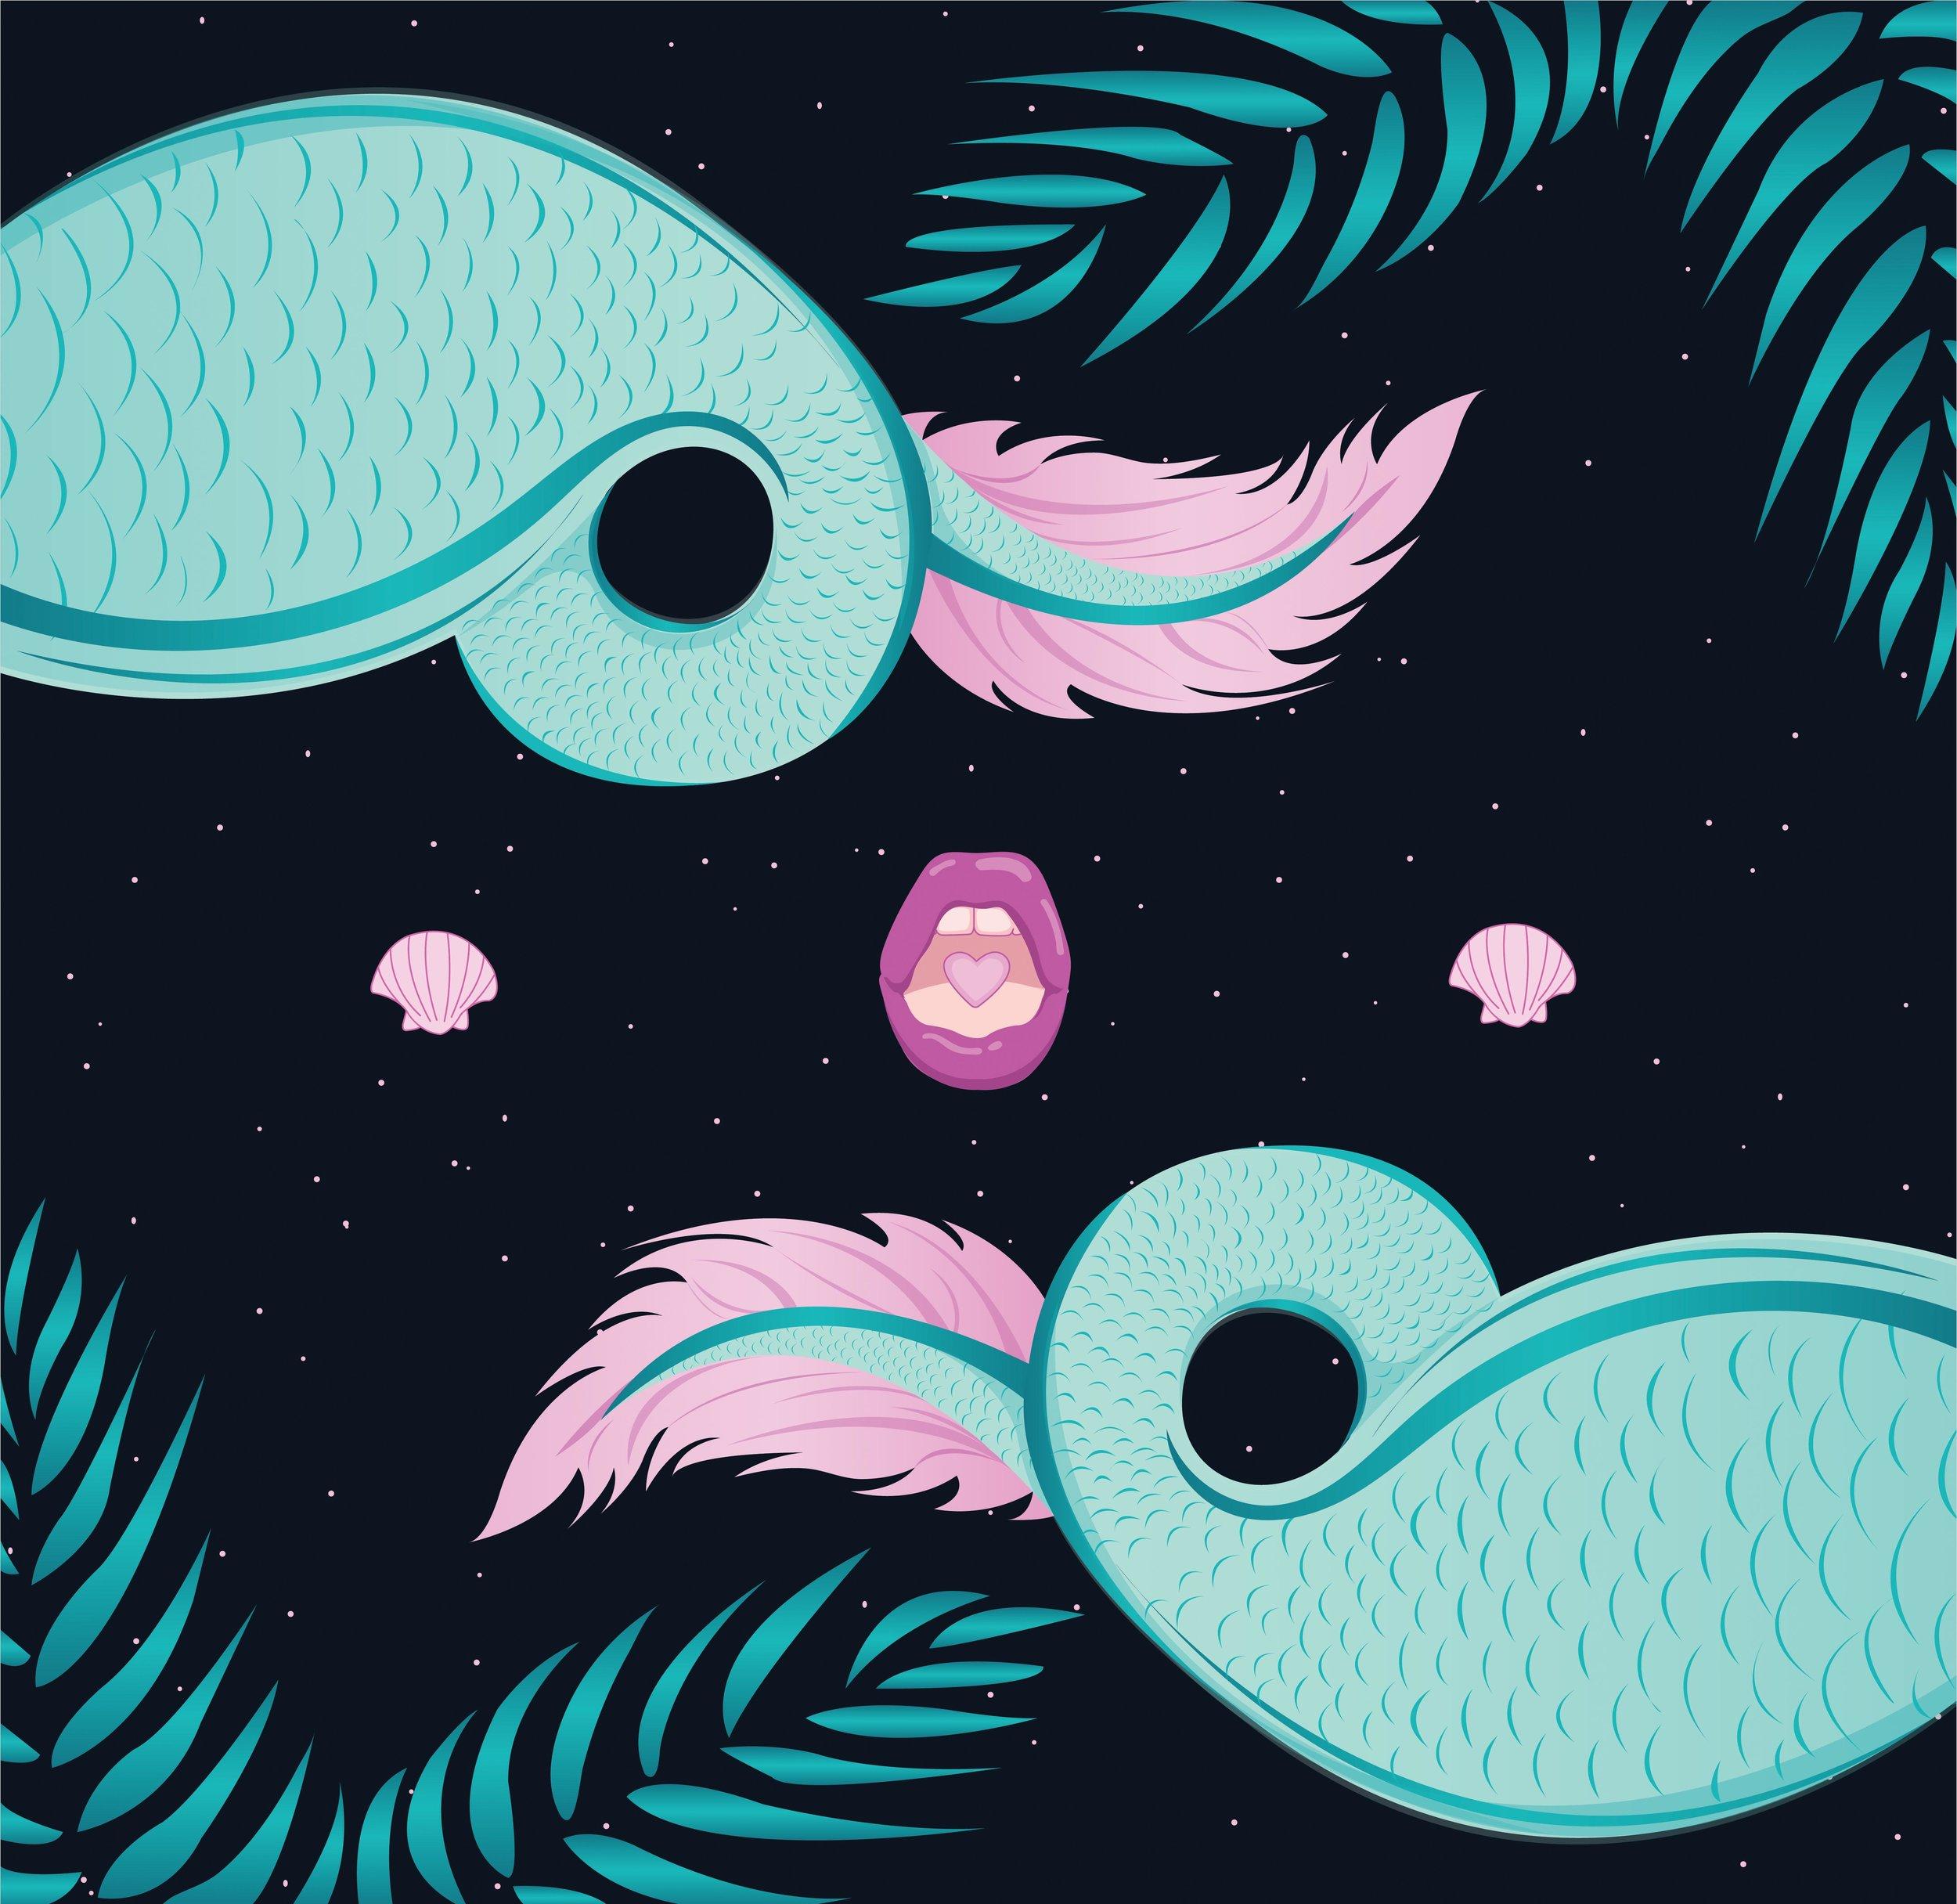 Psychedelic Mermaid Part 2